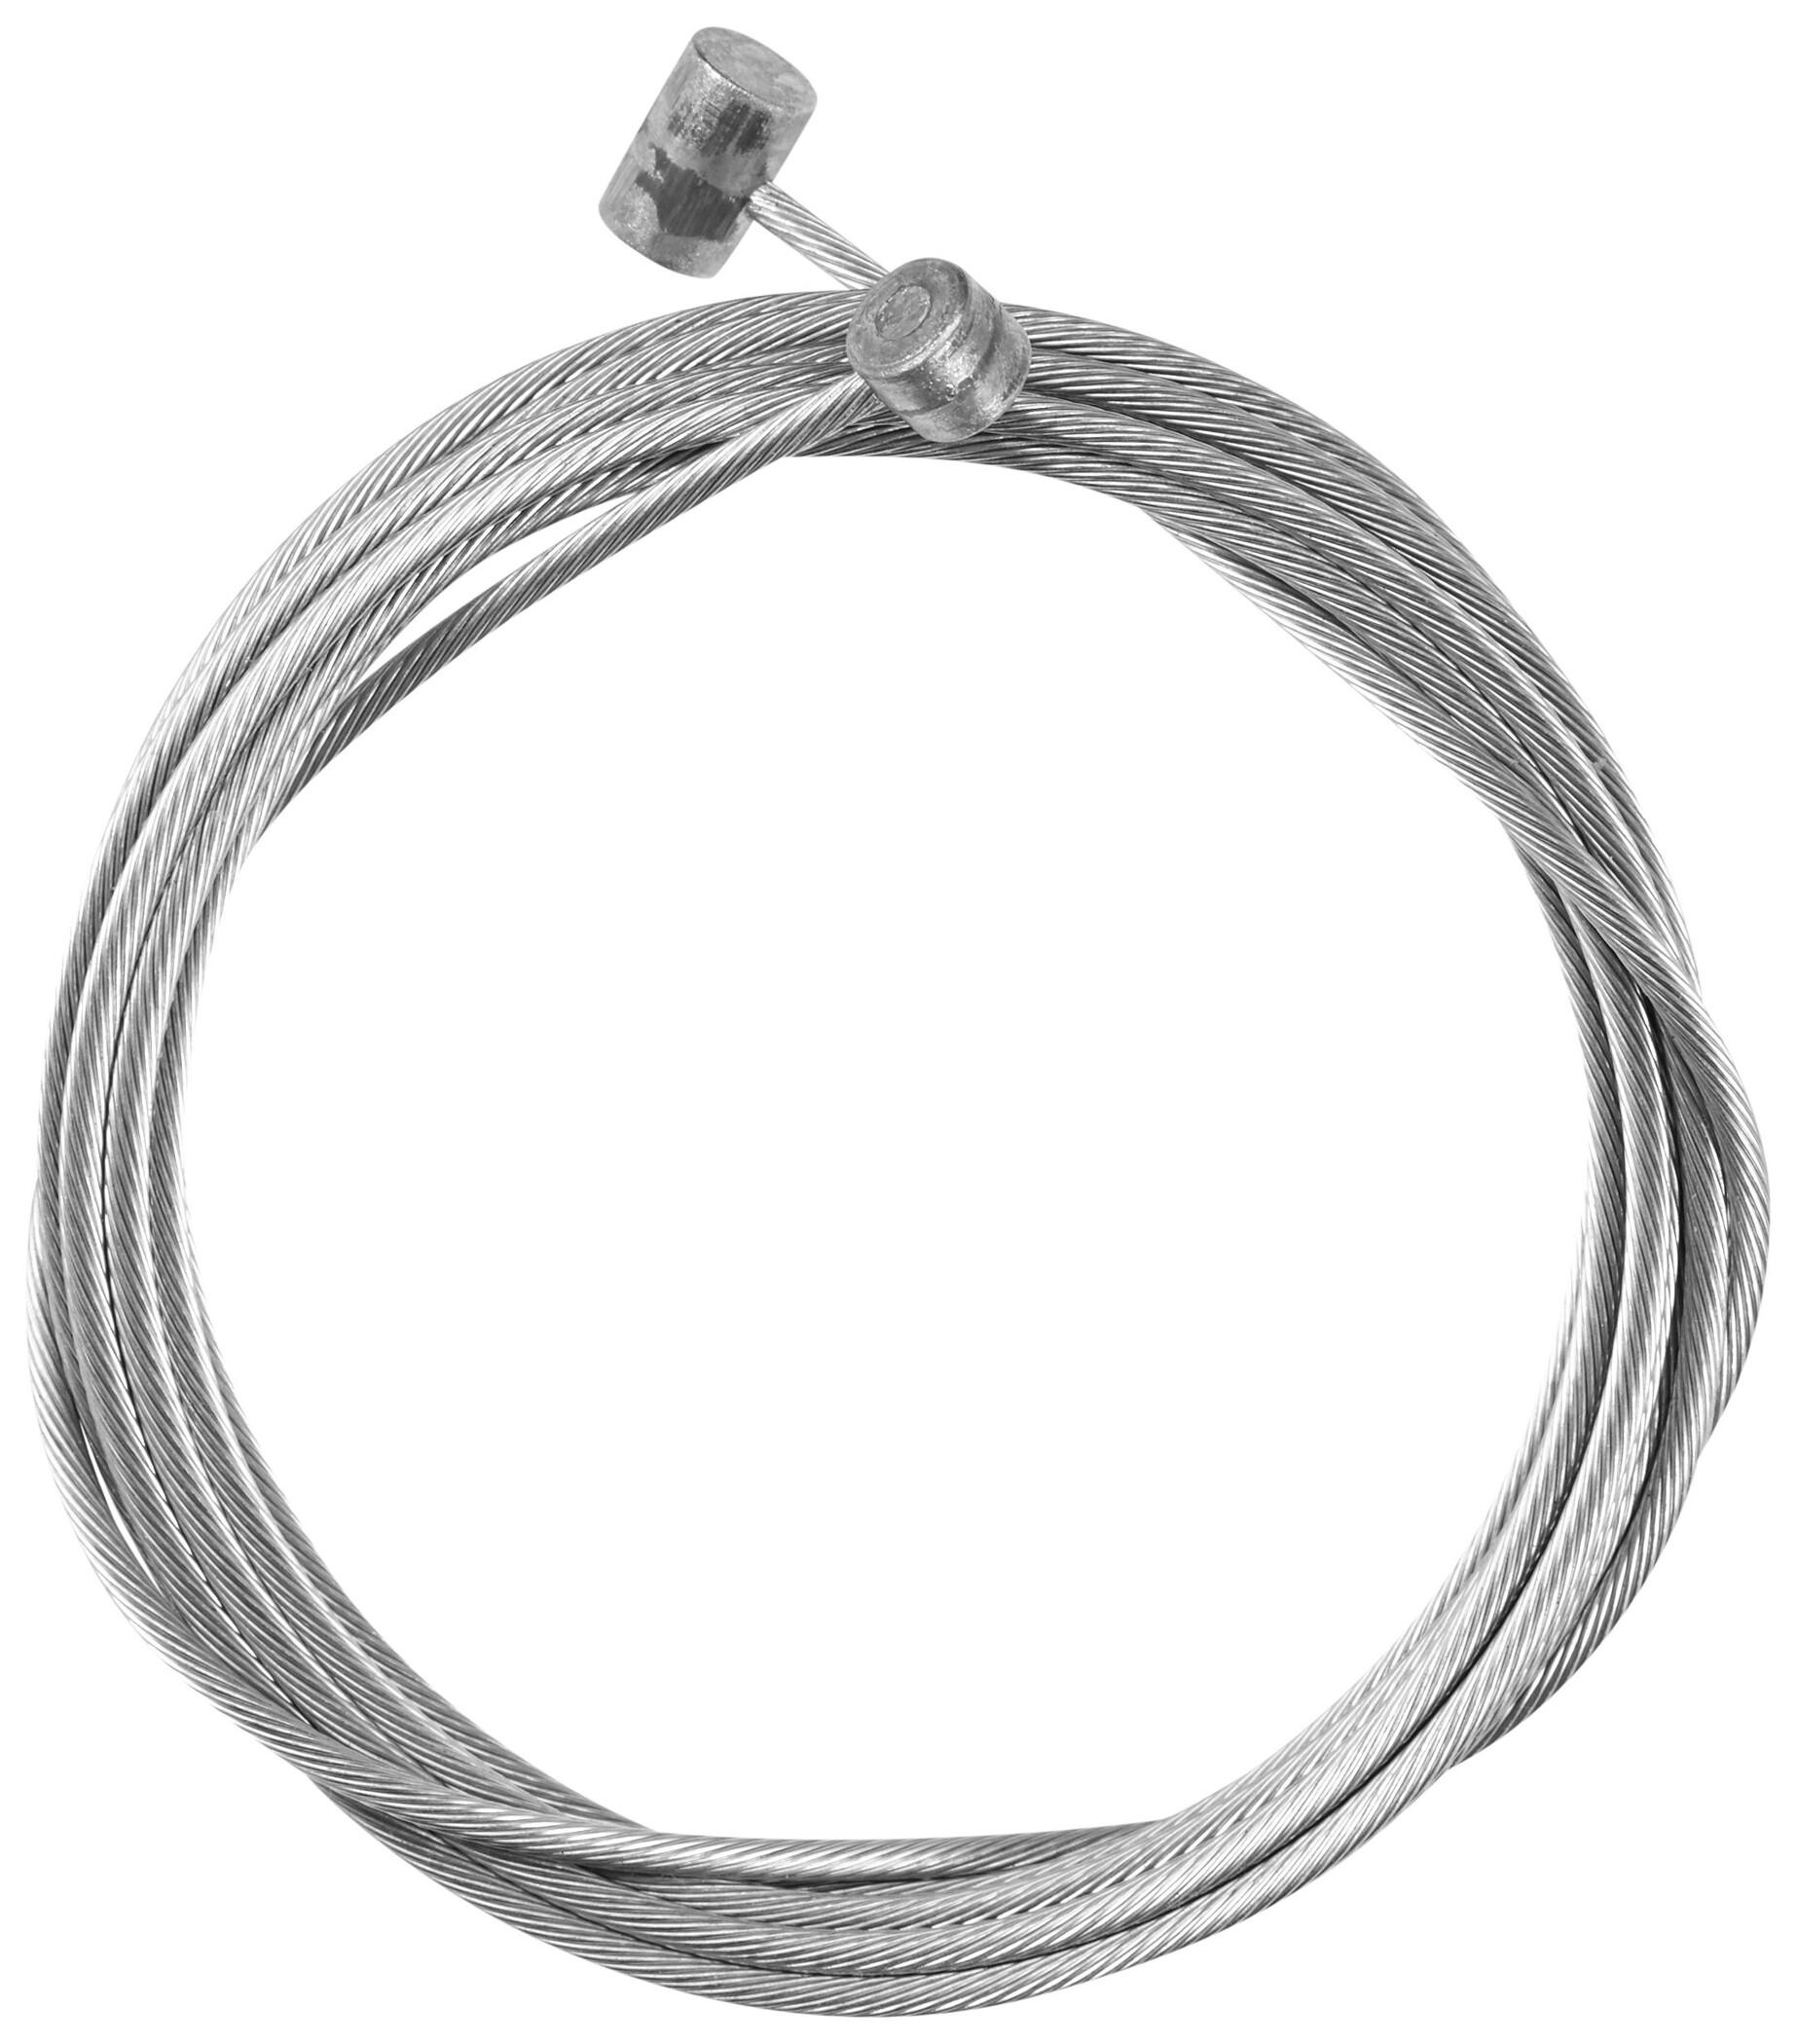 Asista 'MTB Universal Bremsekabel' 205cm (2019) | Brake cables